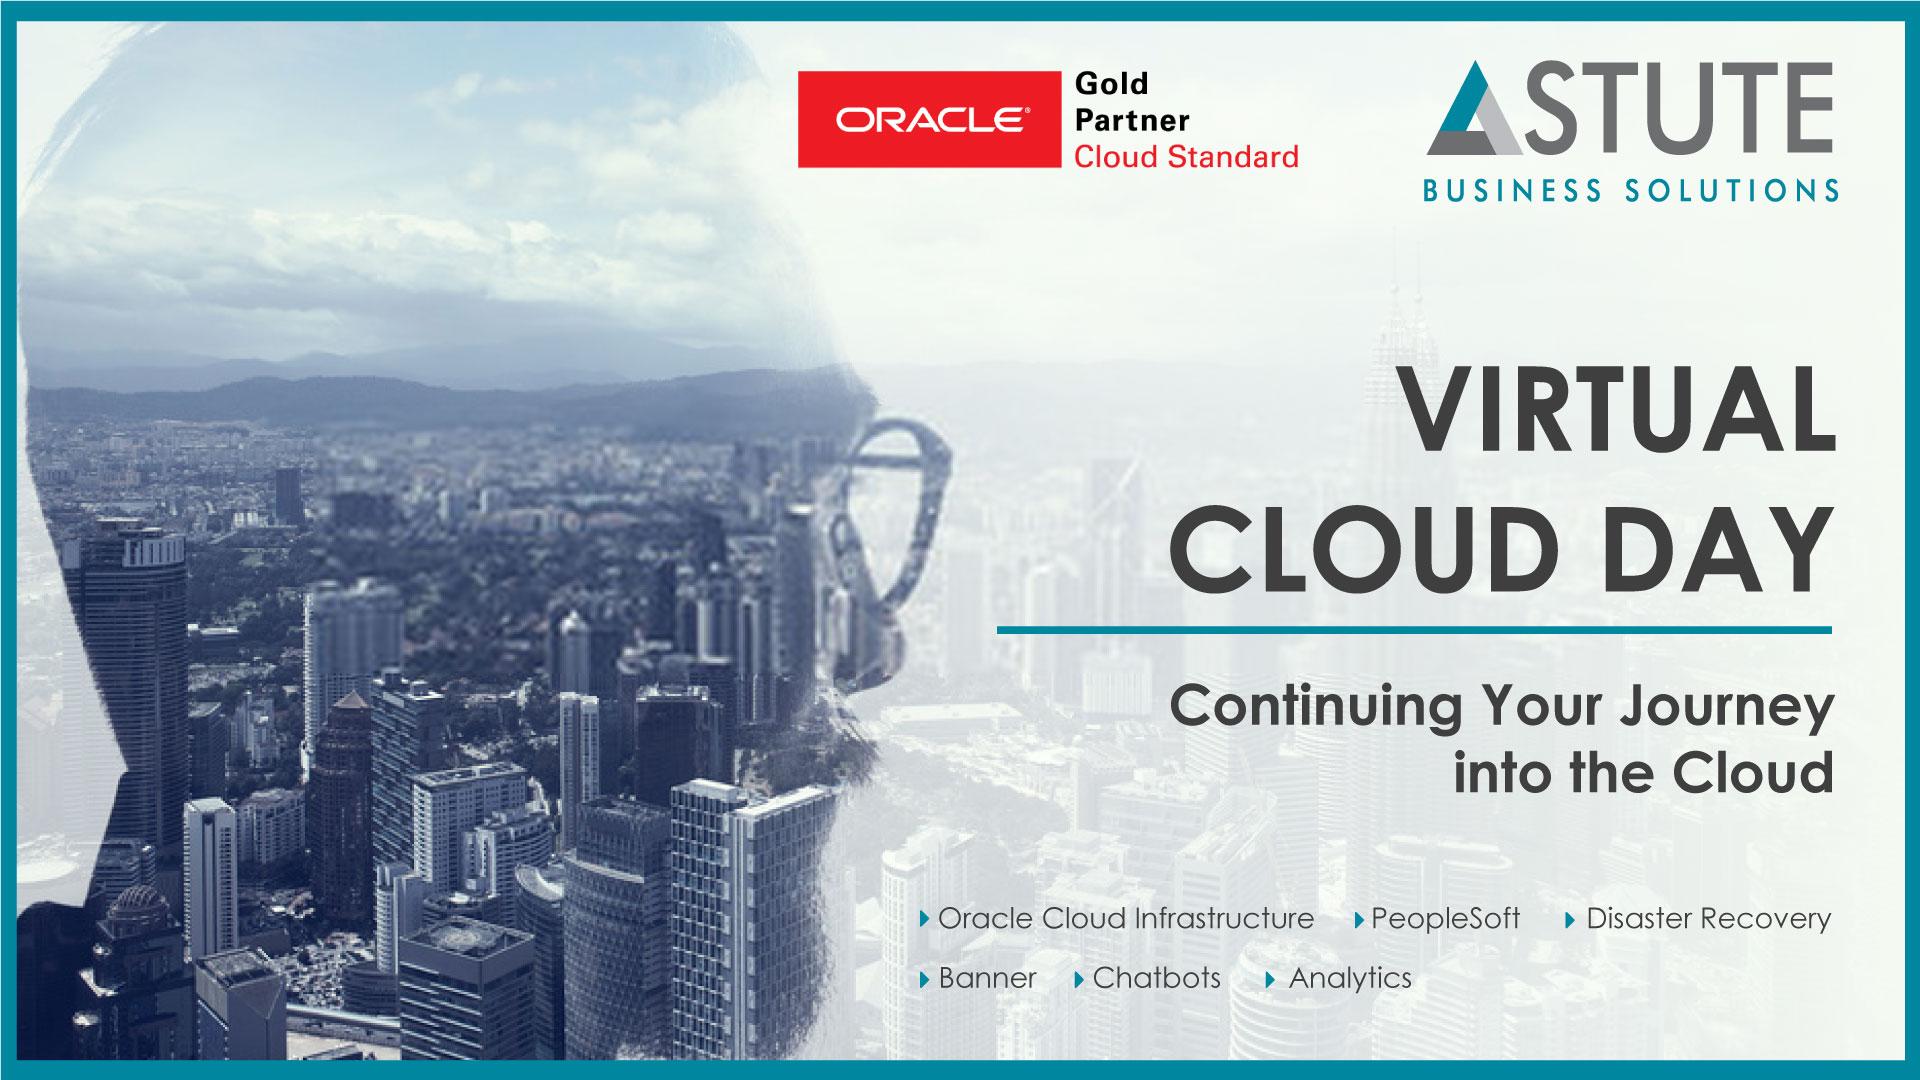 Vertual-Cloud-Day-sm-1